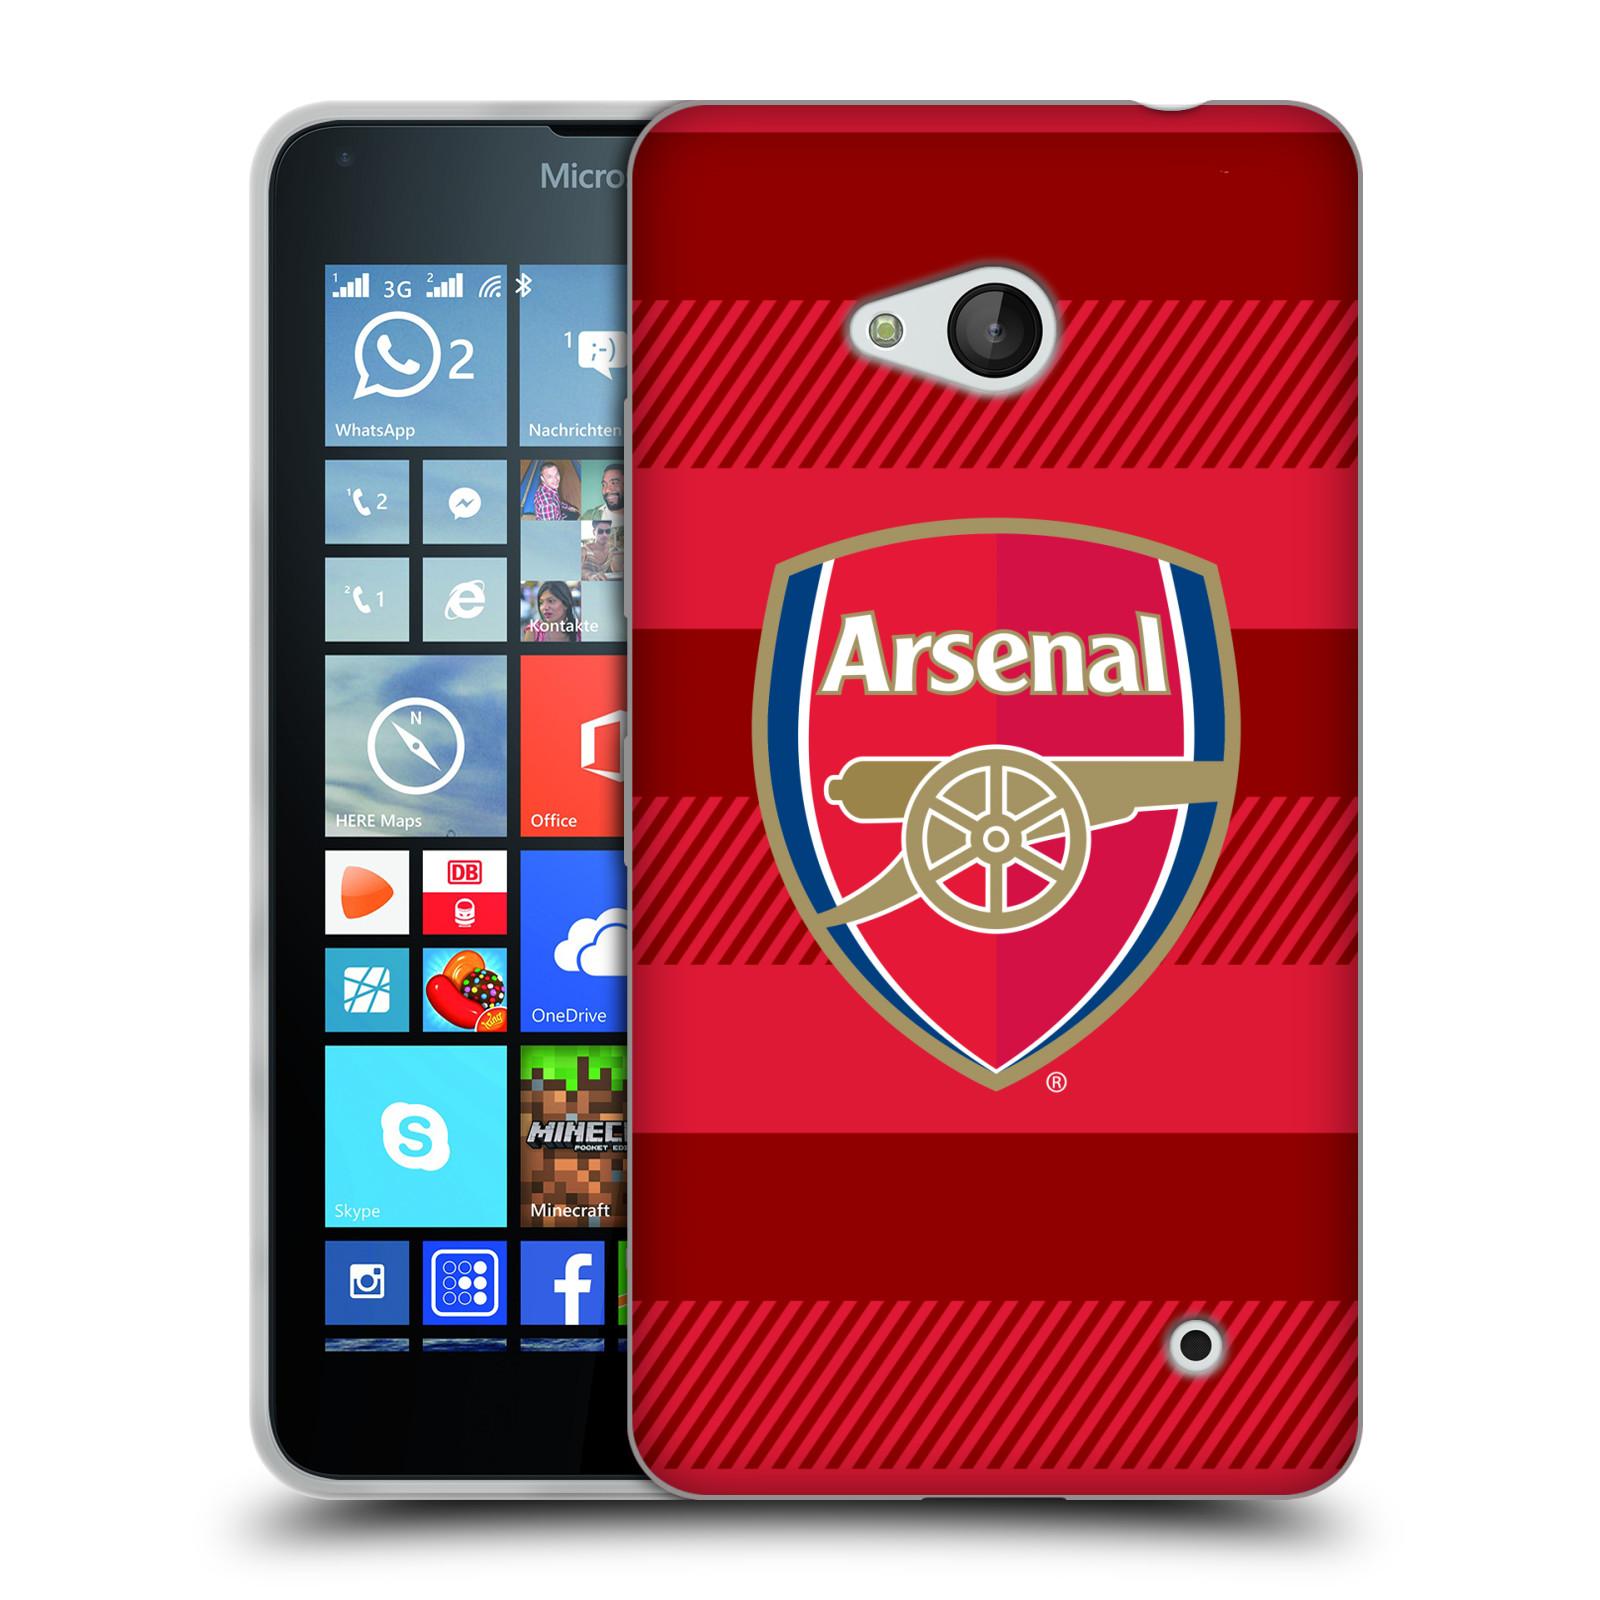 Silikonové pouzdro na mobil Microsoft Lumia 640 - Head Case - Arsenal FC - Logo s pruhy